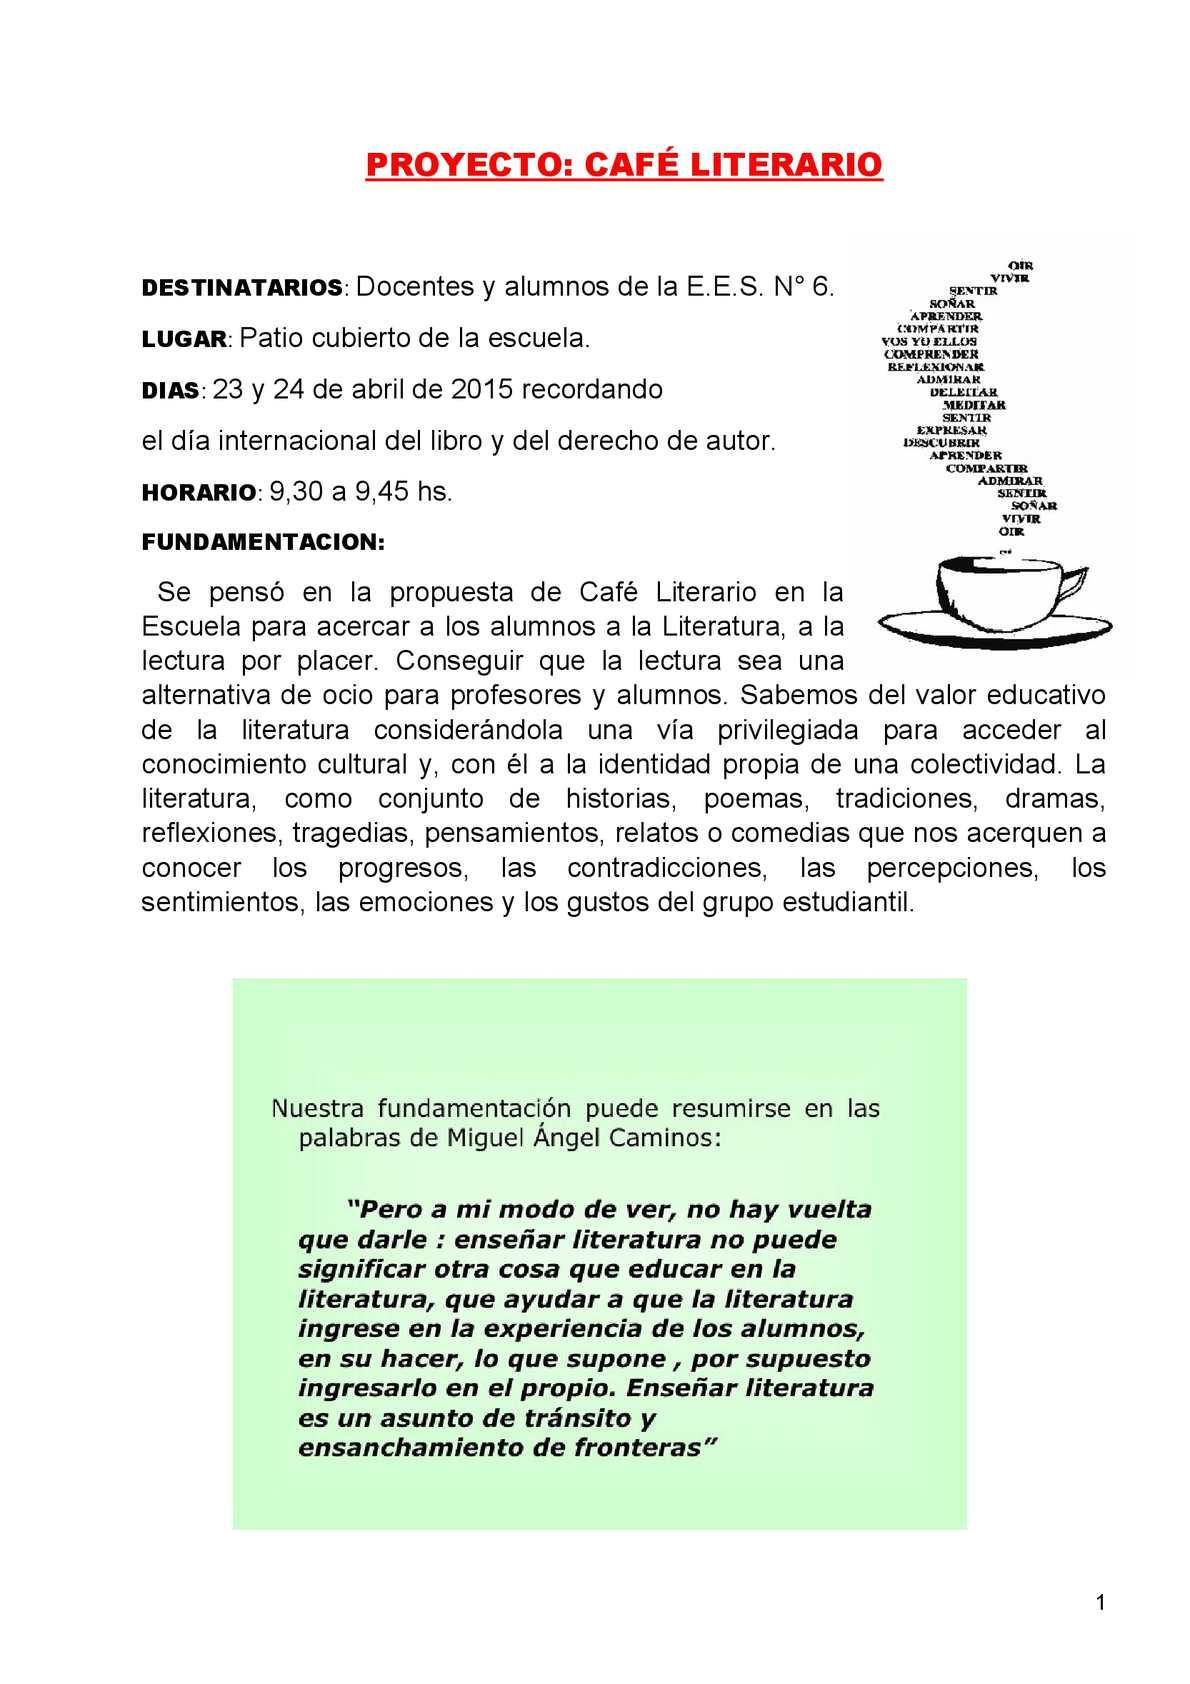 Calam O Proyecto Caf Literario